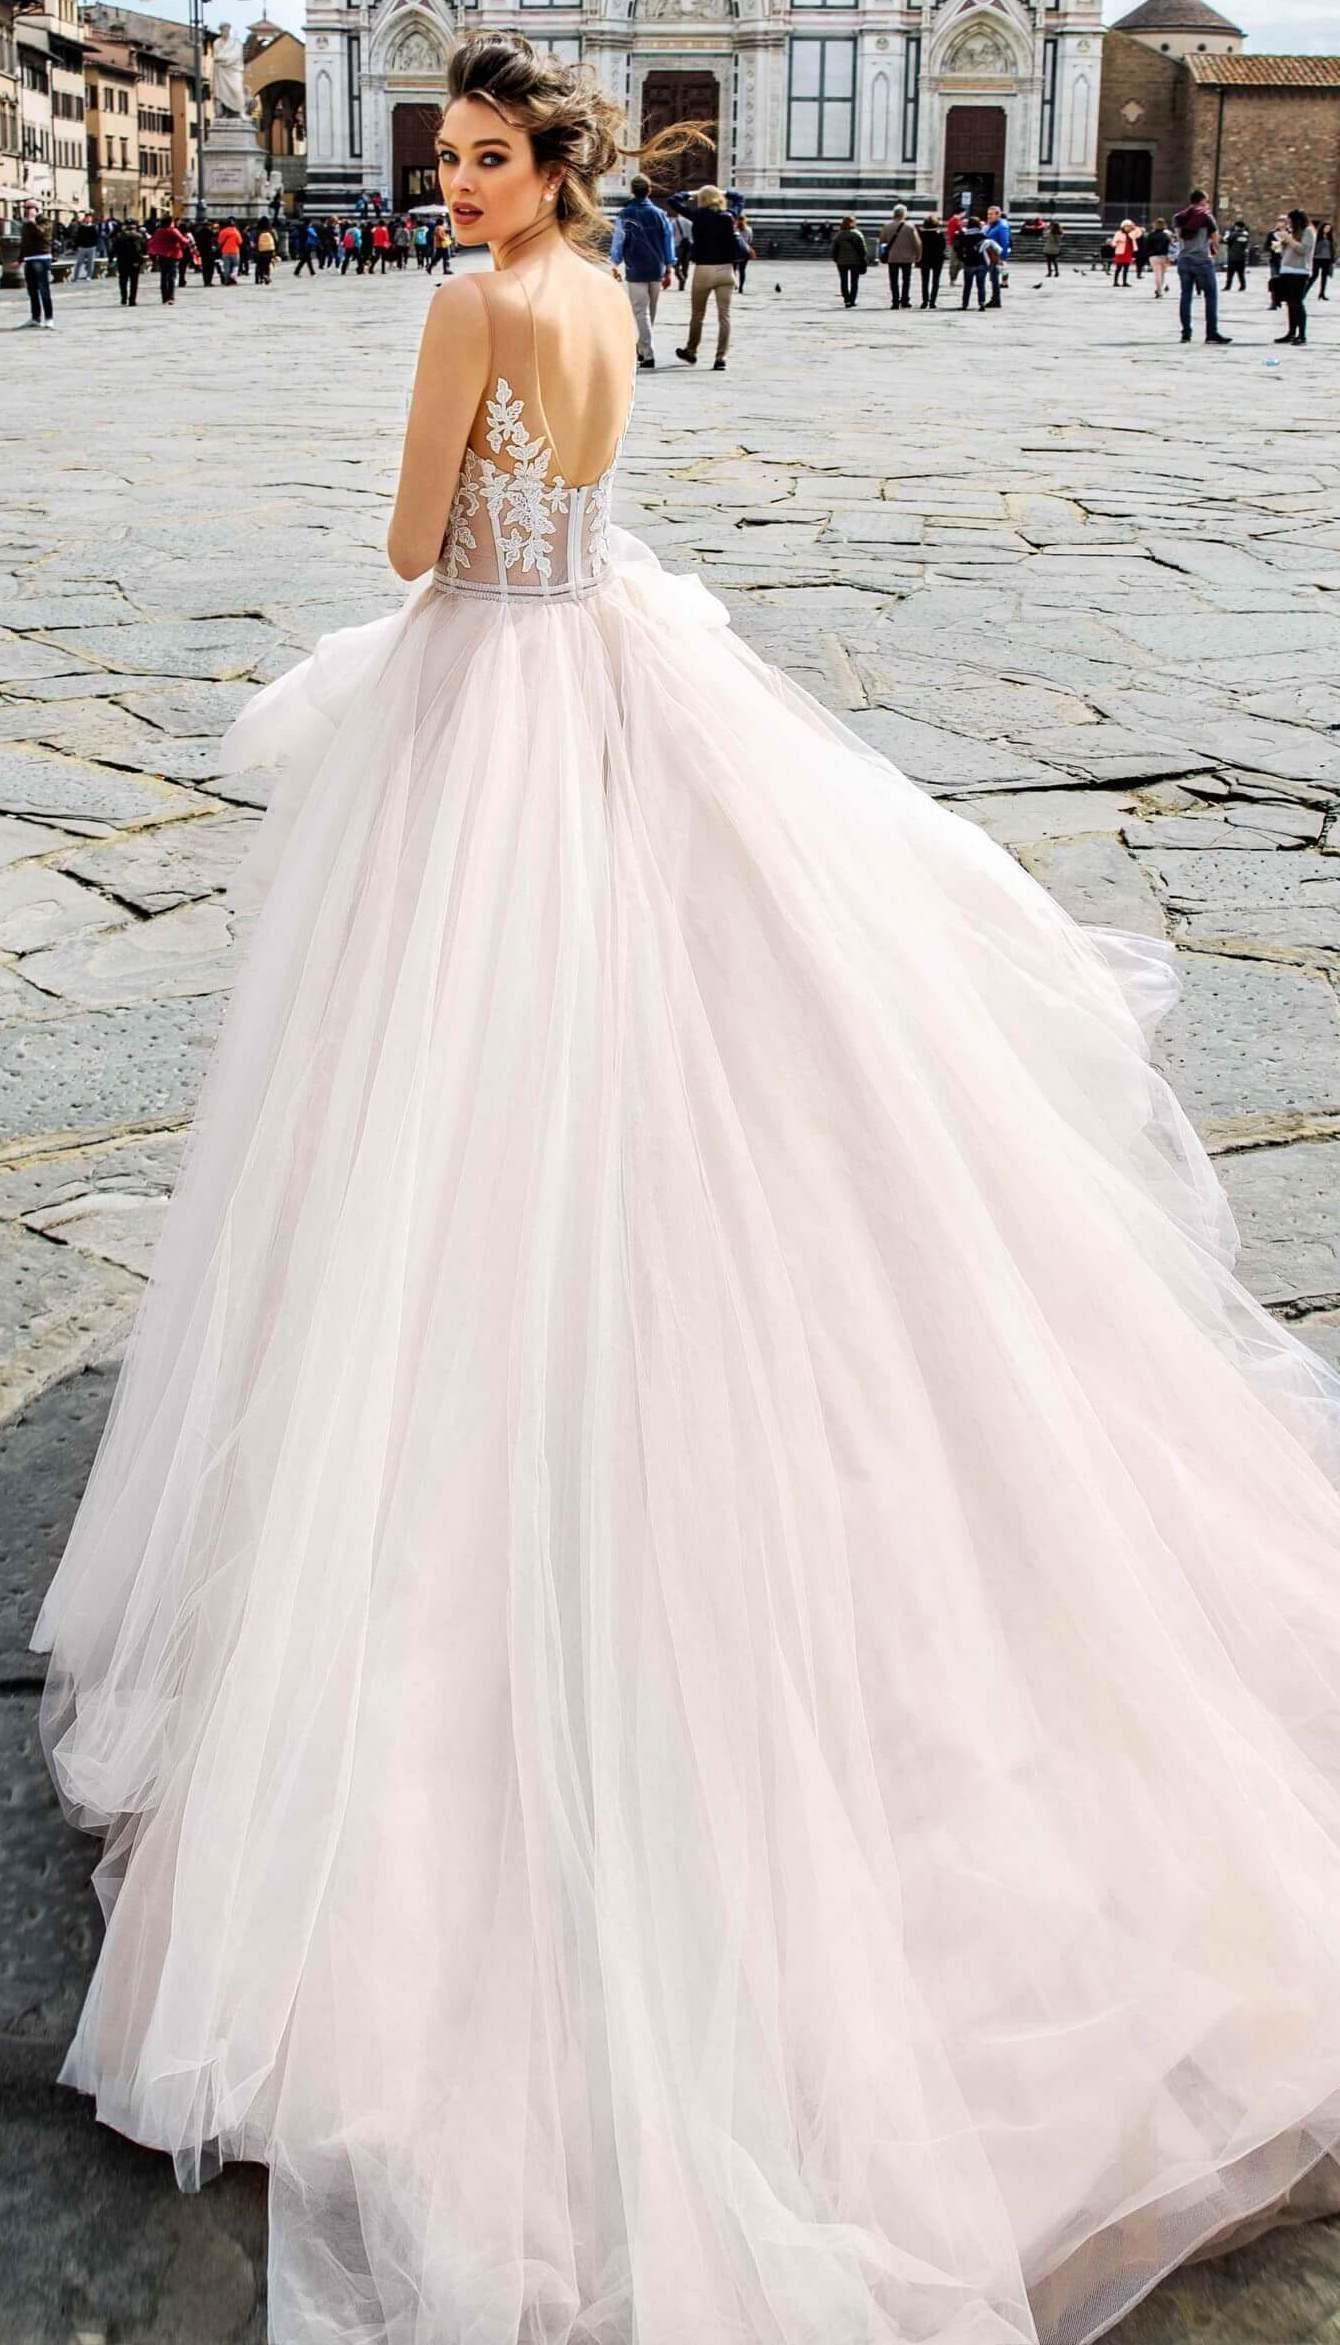 Blush Ball Gown Wedding Dress By Innocentia Ginevra Benci Romantic Backless Lace Bodice Tul Princess Wedding Dresses Wedding Dresses Ball Gown Wedding Dress